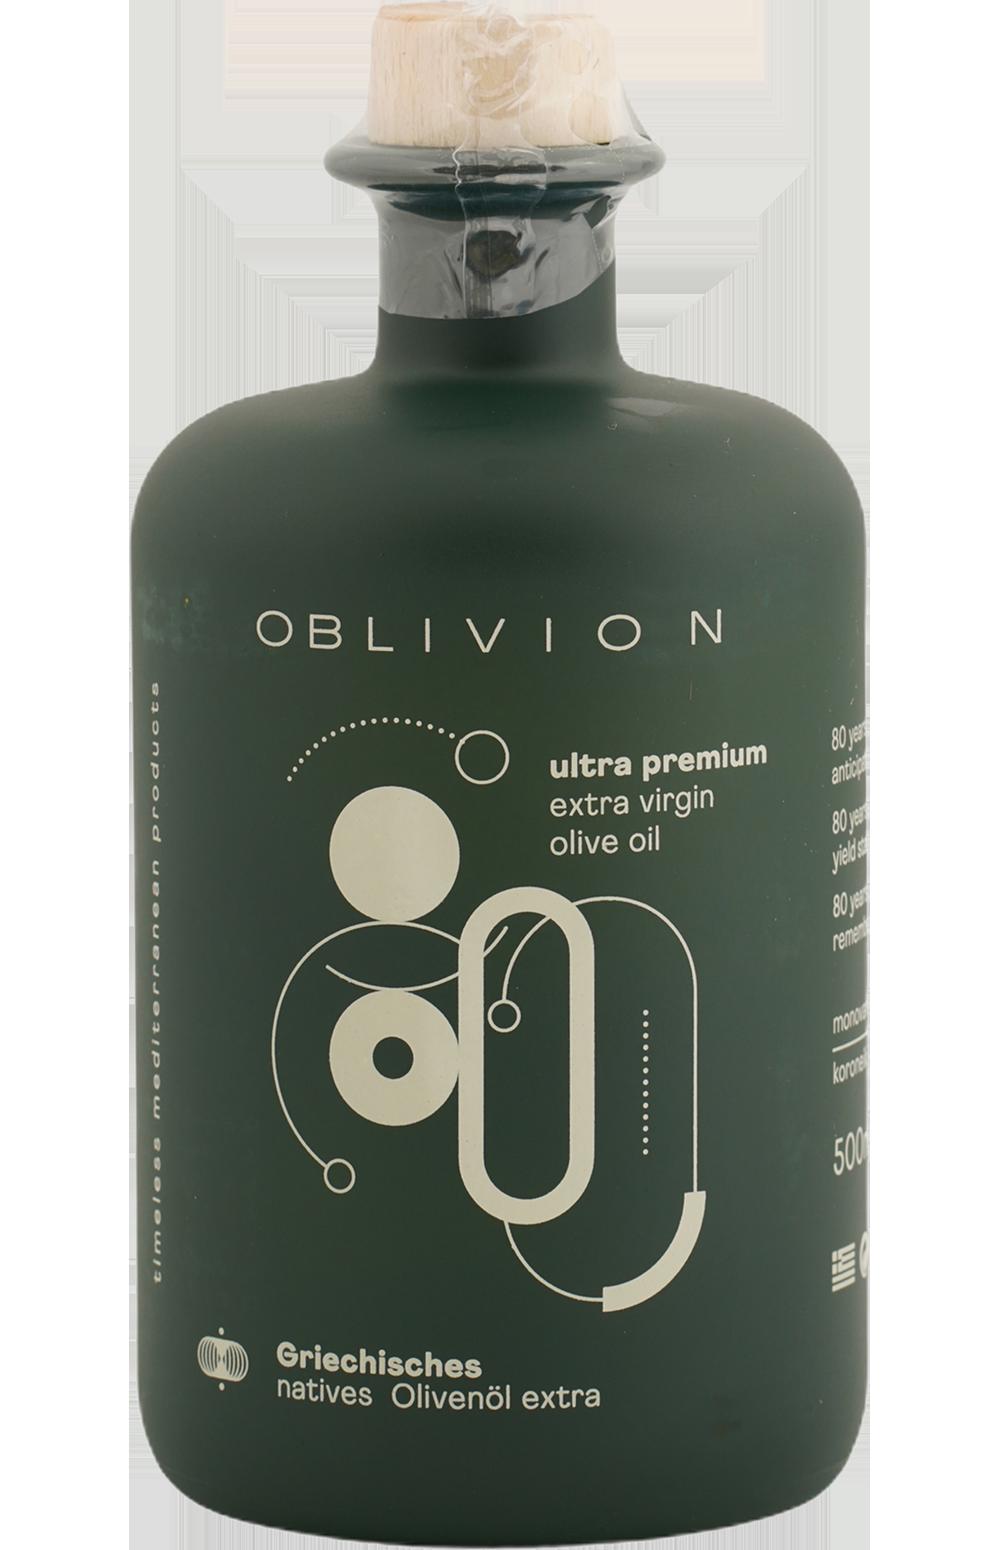 Oblivion Ultra Premium